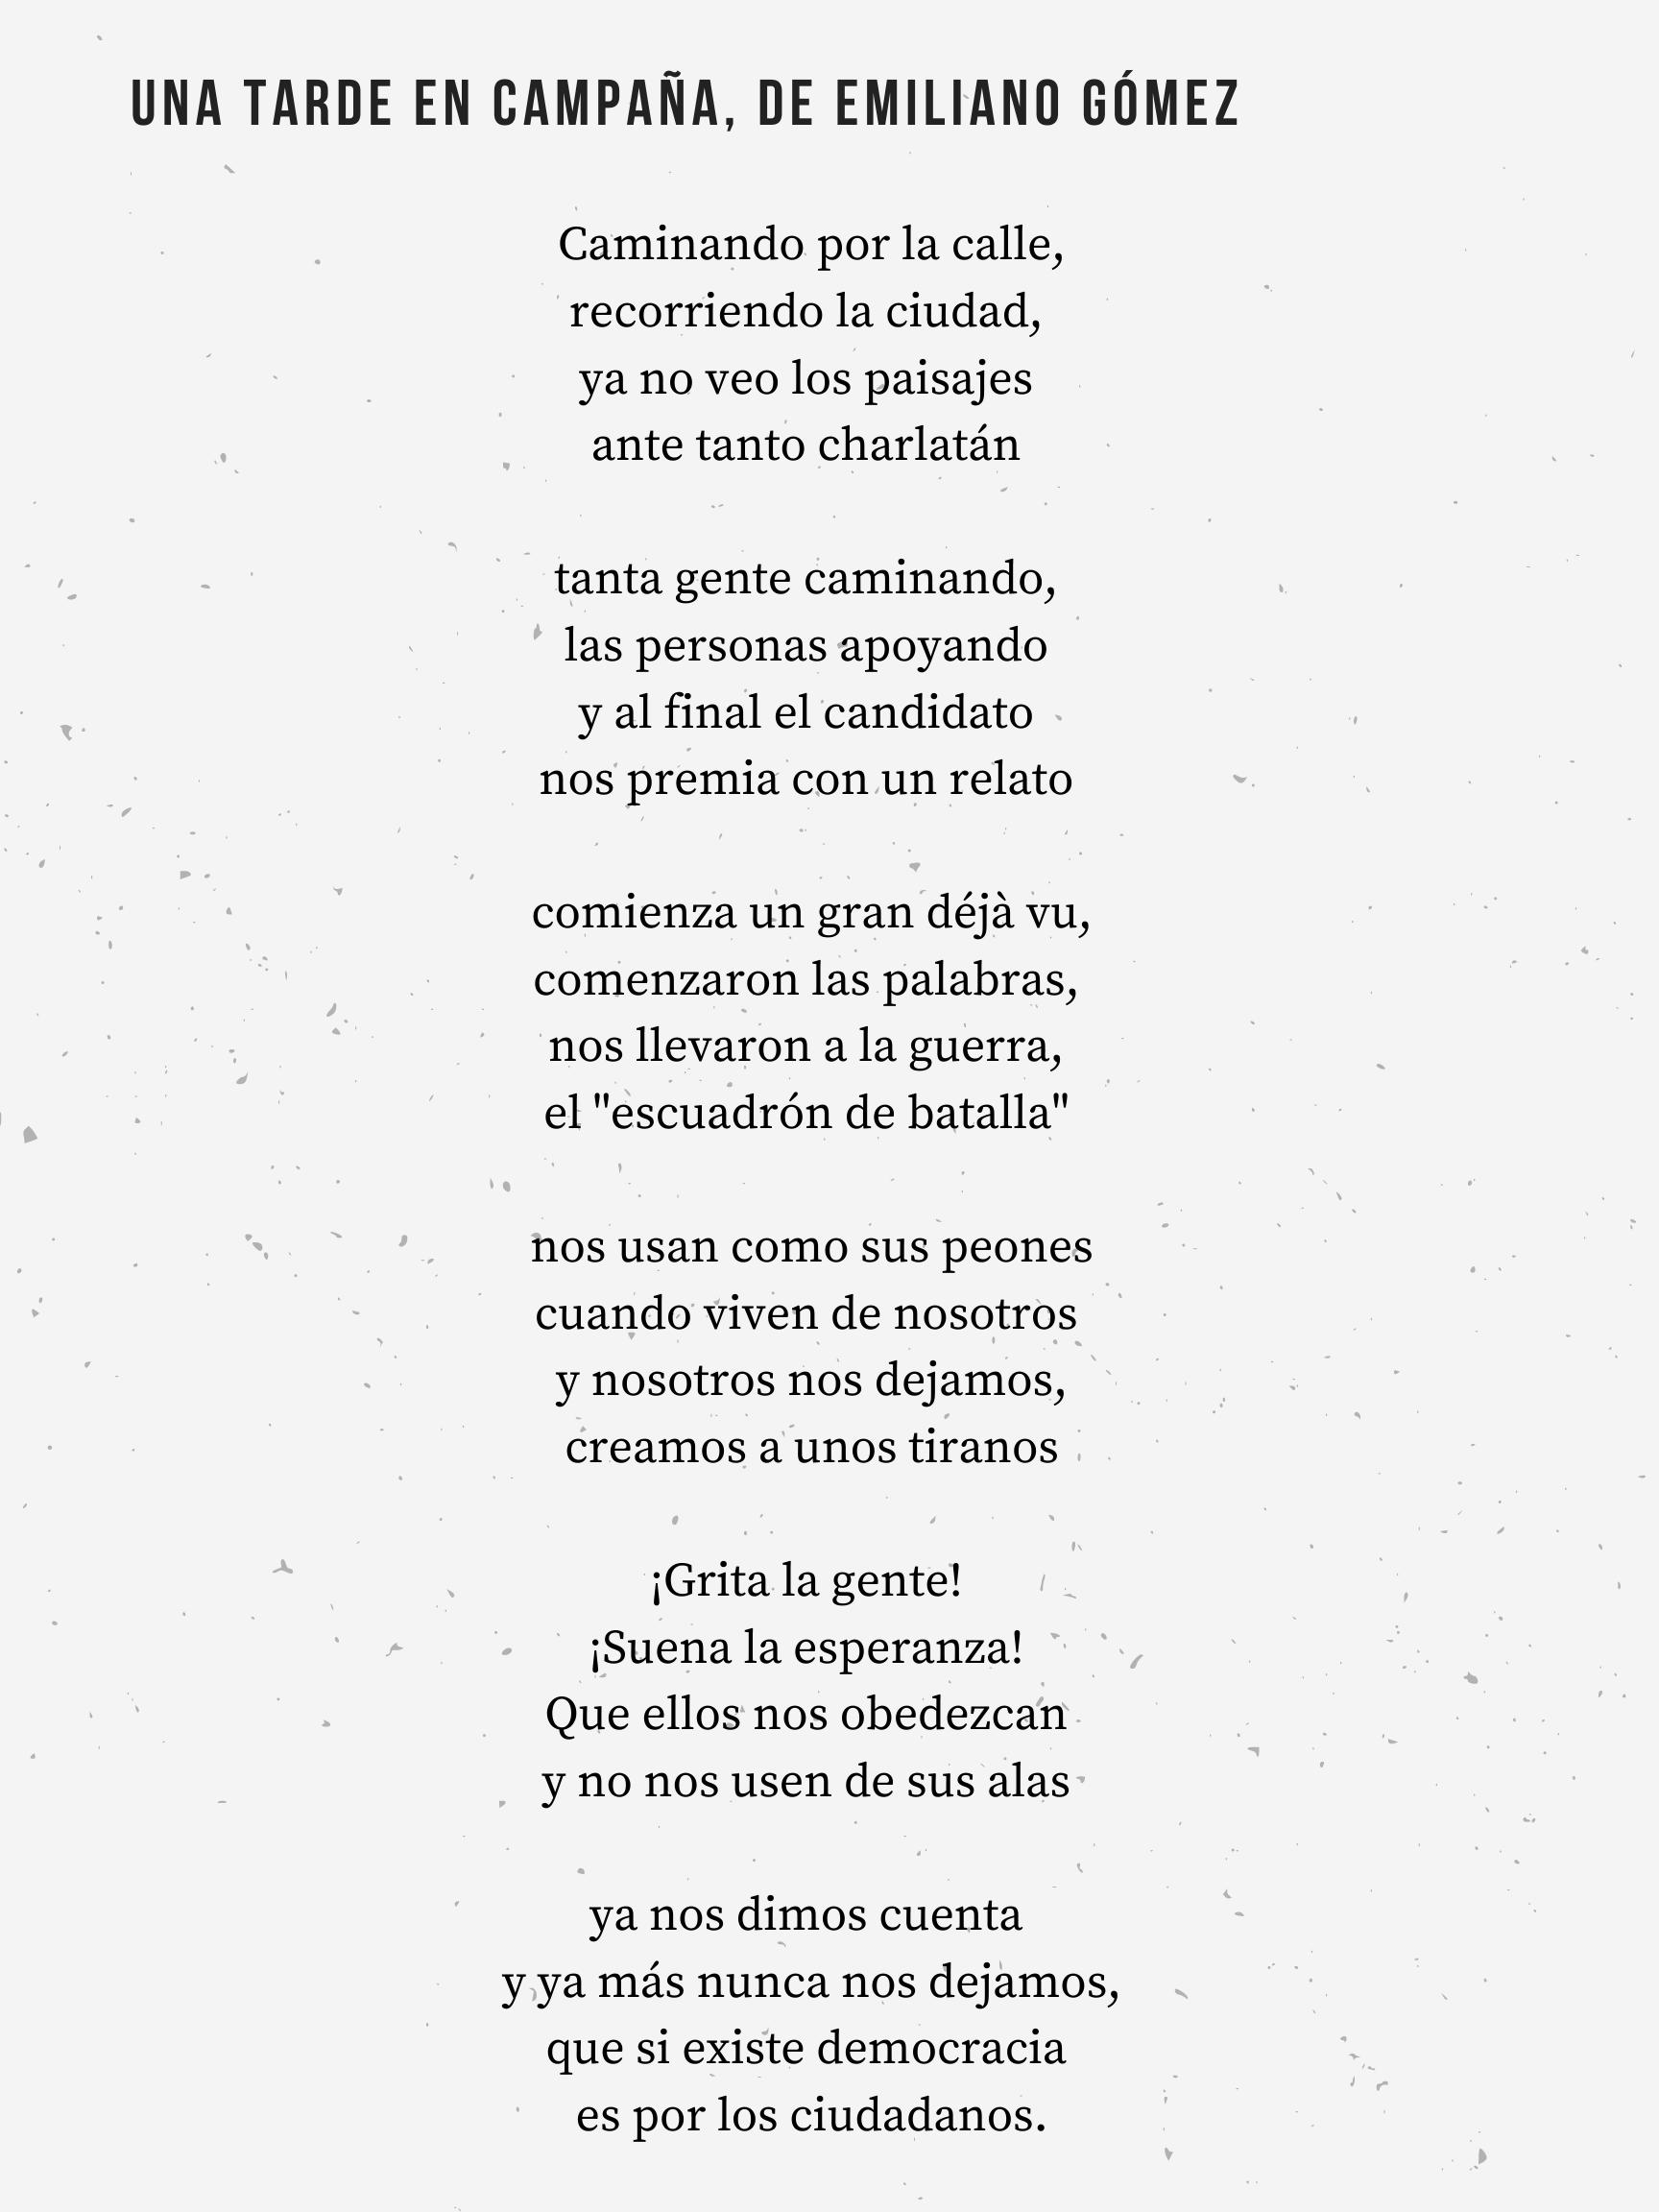 UnaTardeEnCampana_EmilianoGomez